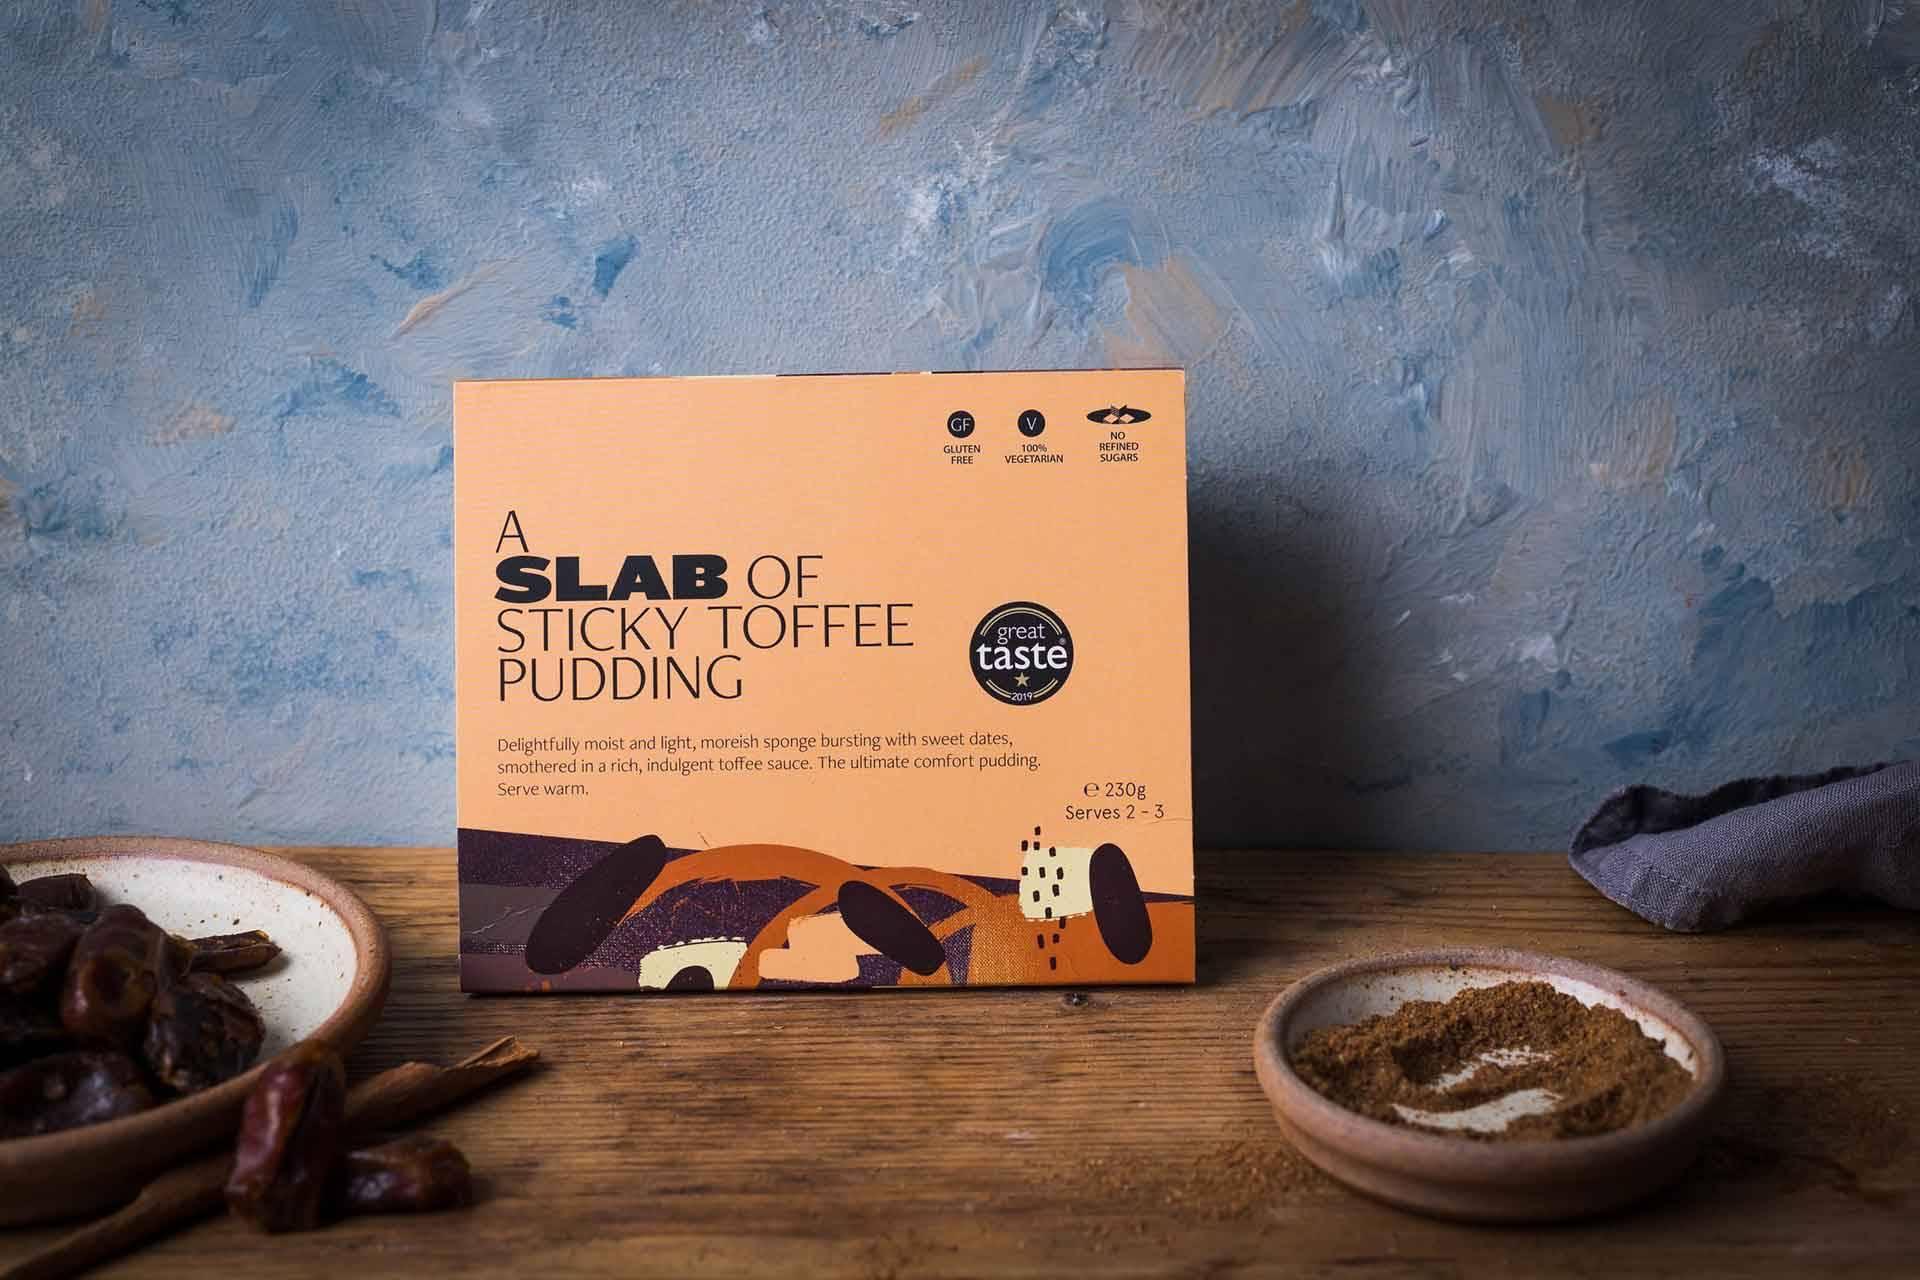 Slab Sticky Toffee Pudding